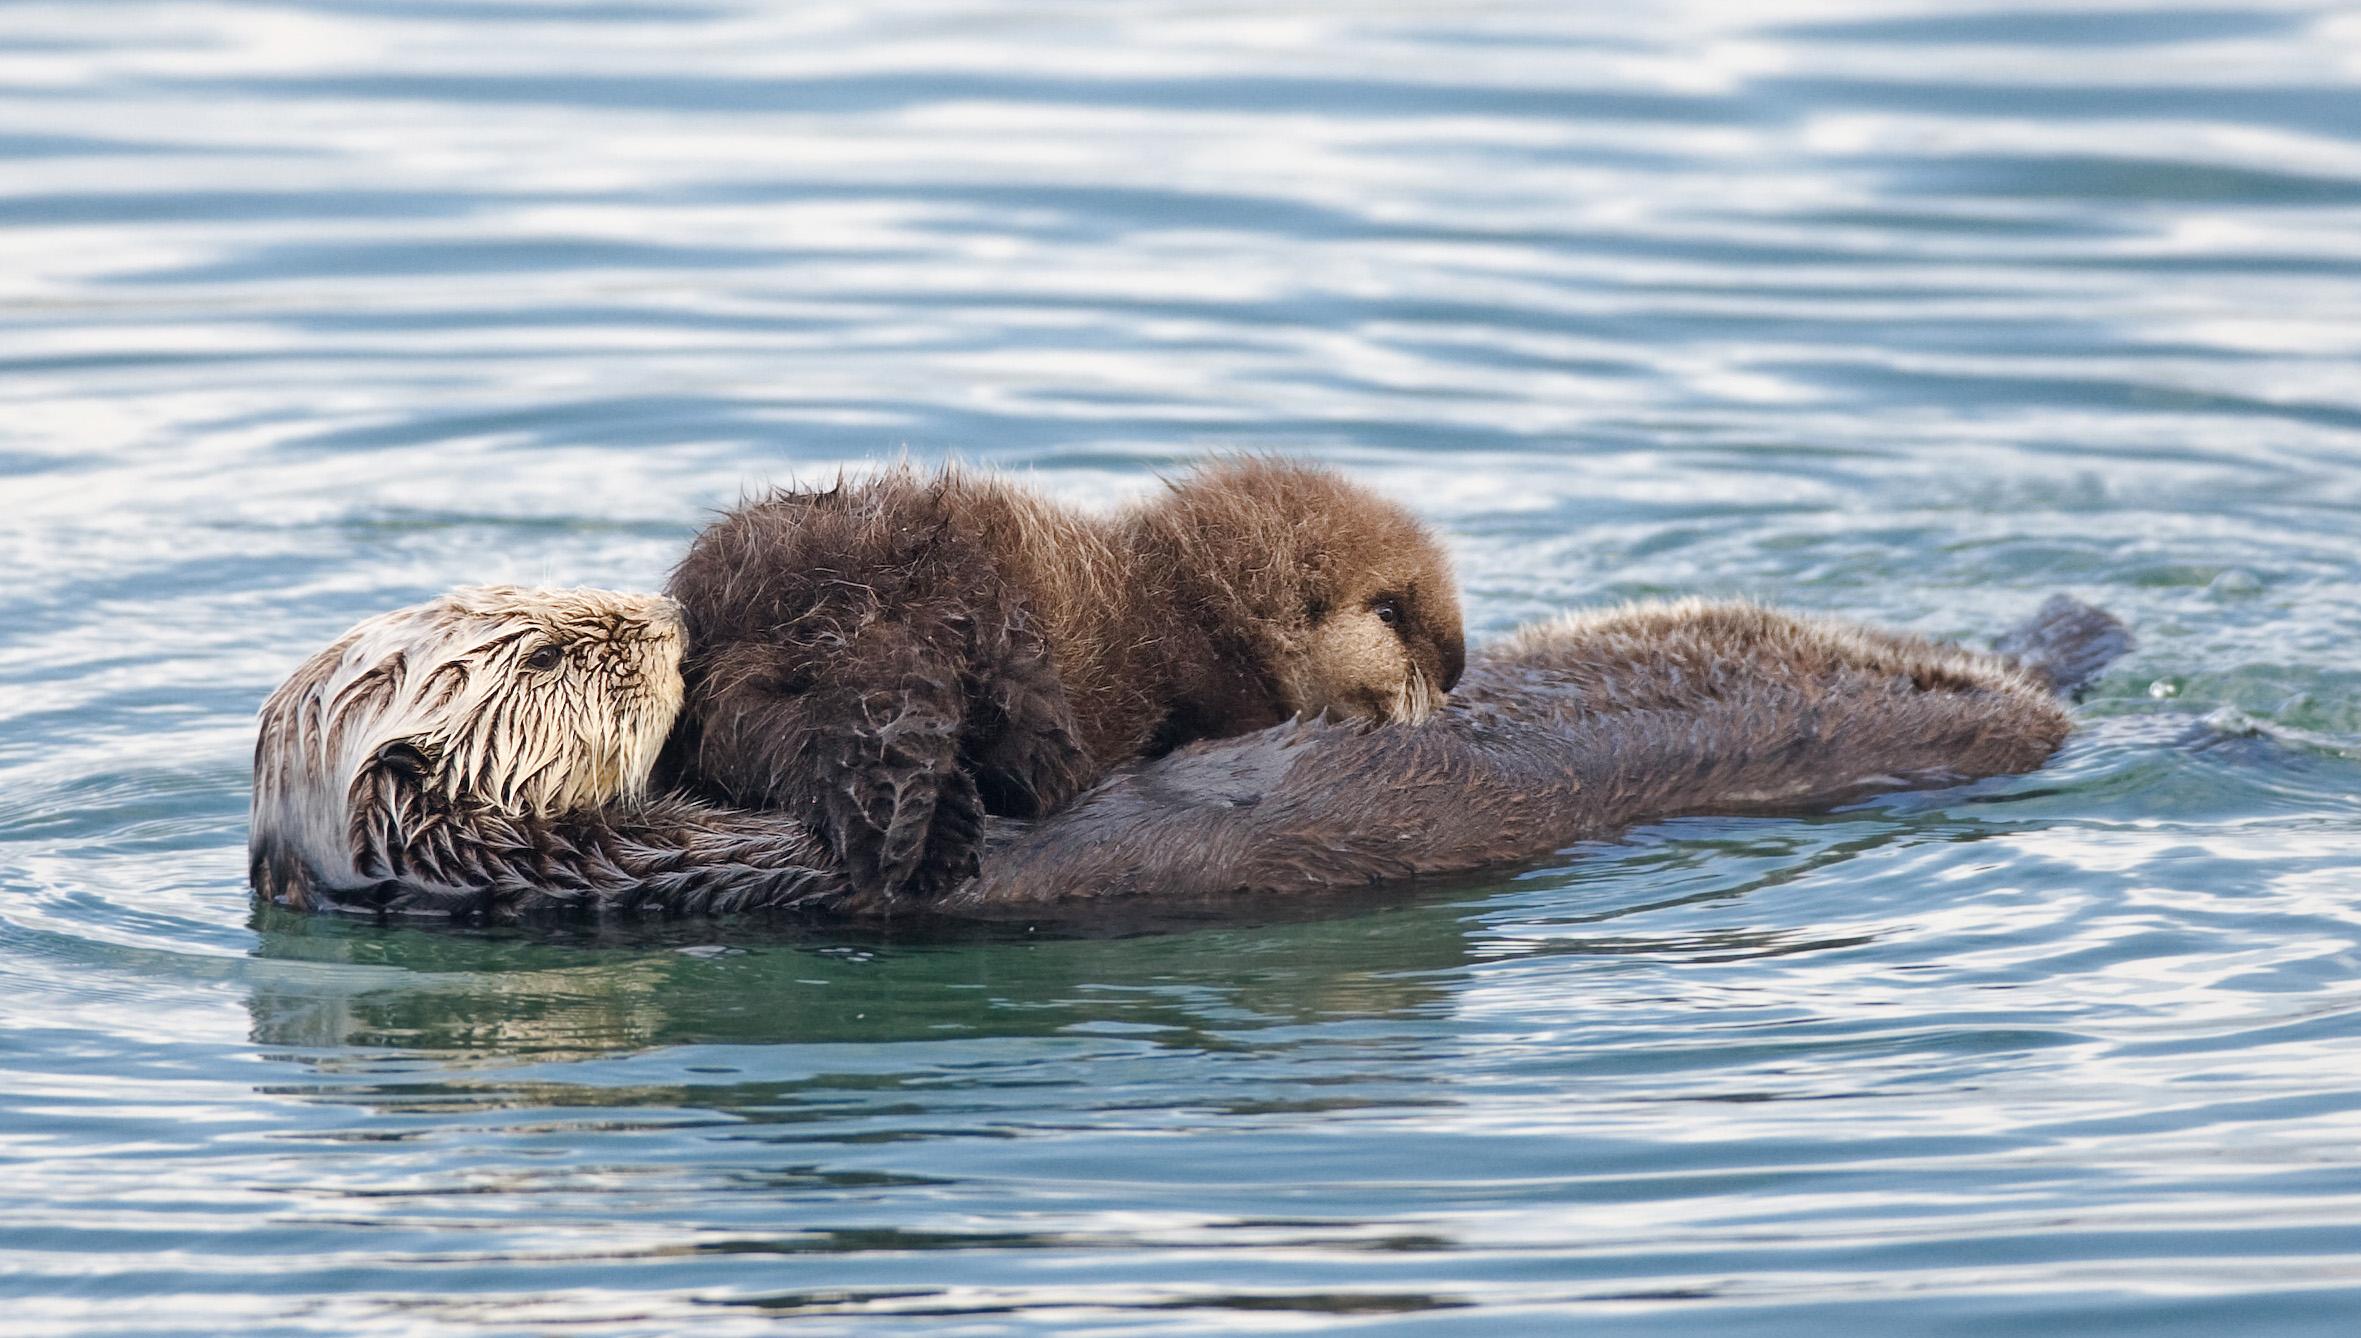 super otter photos image